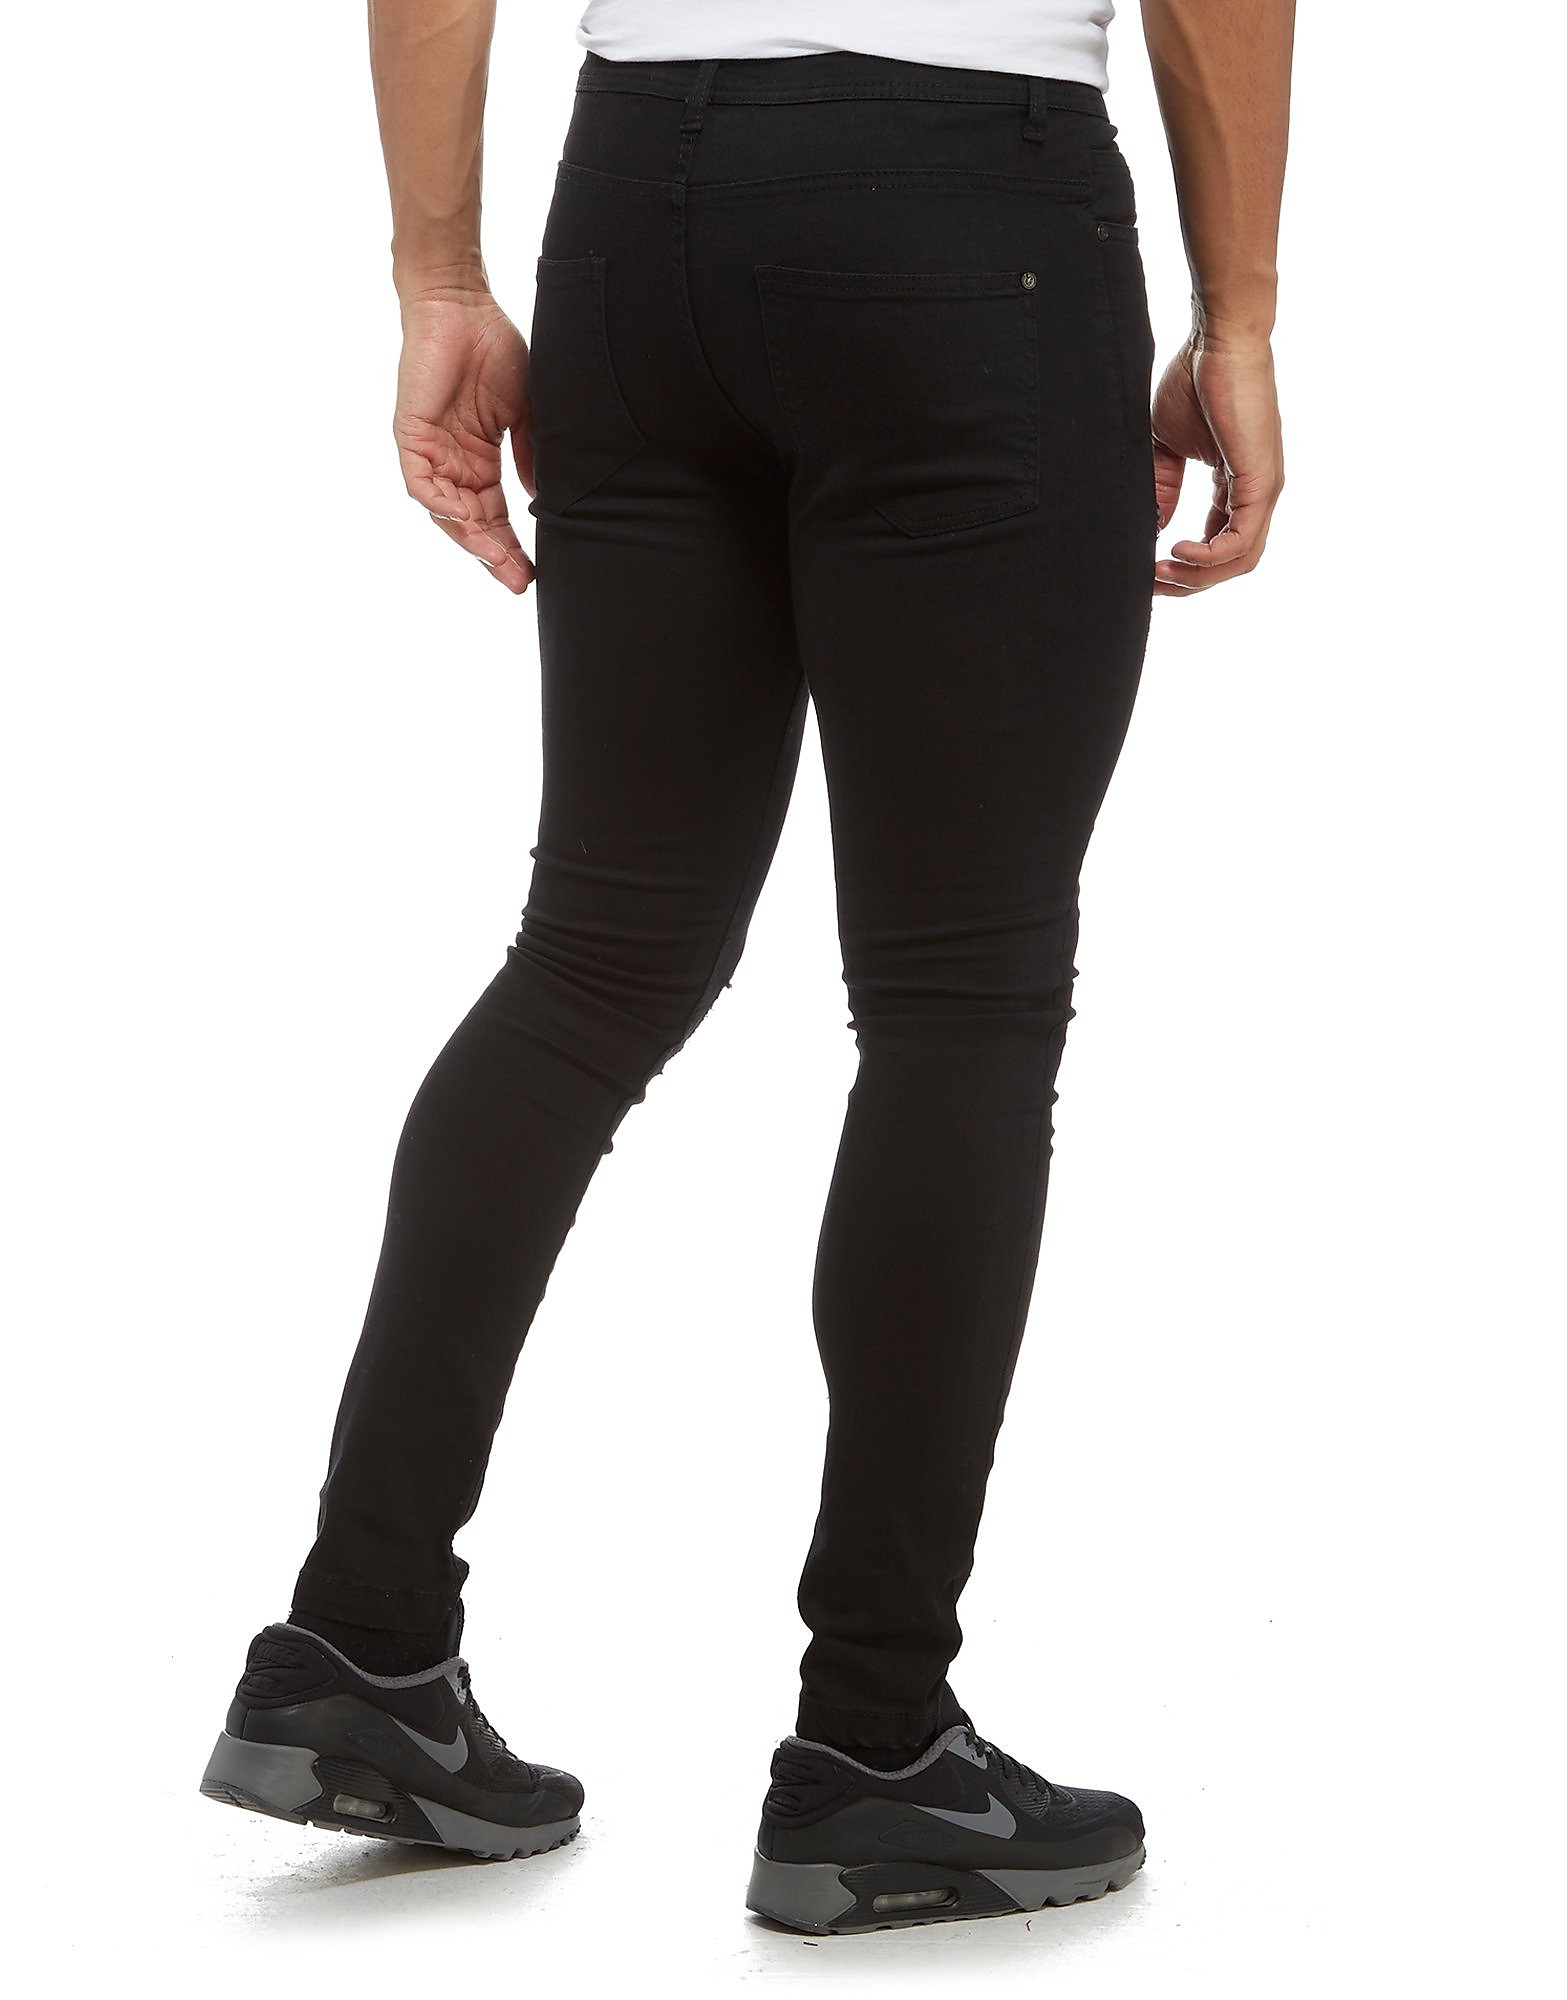 Supply & Demand Caliber Jeans